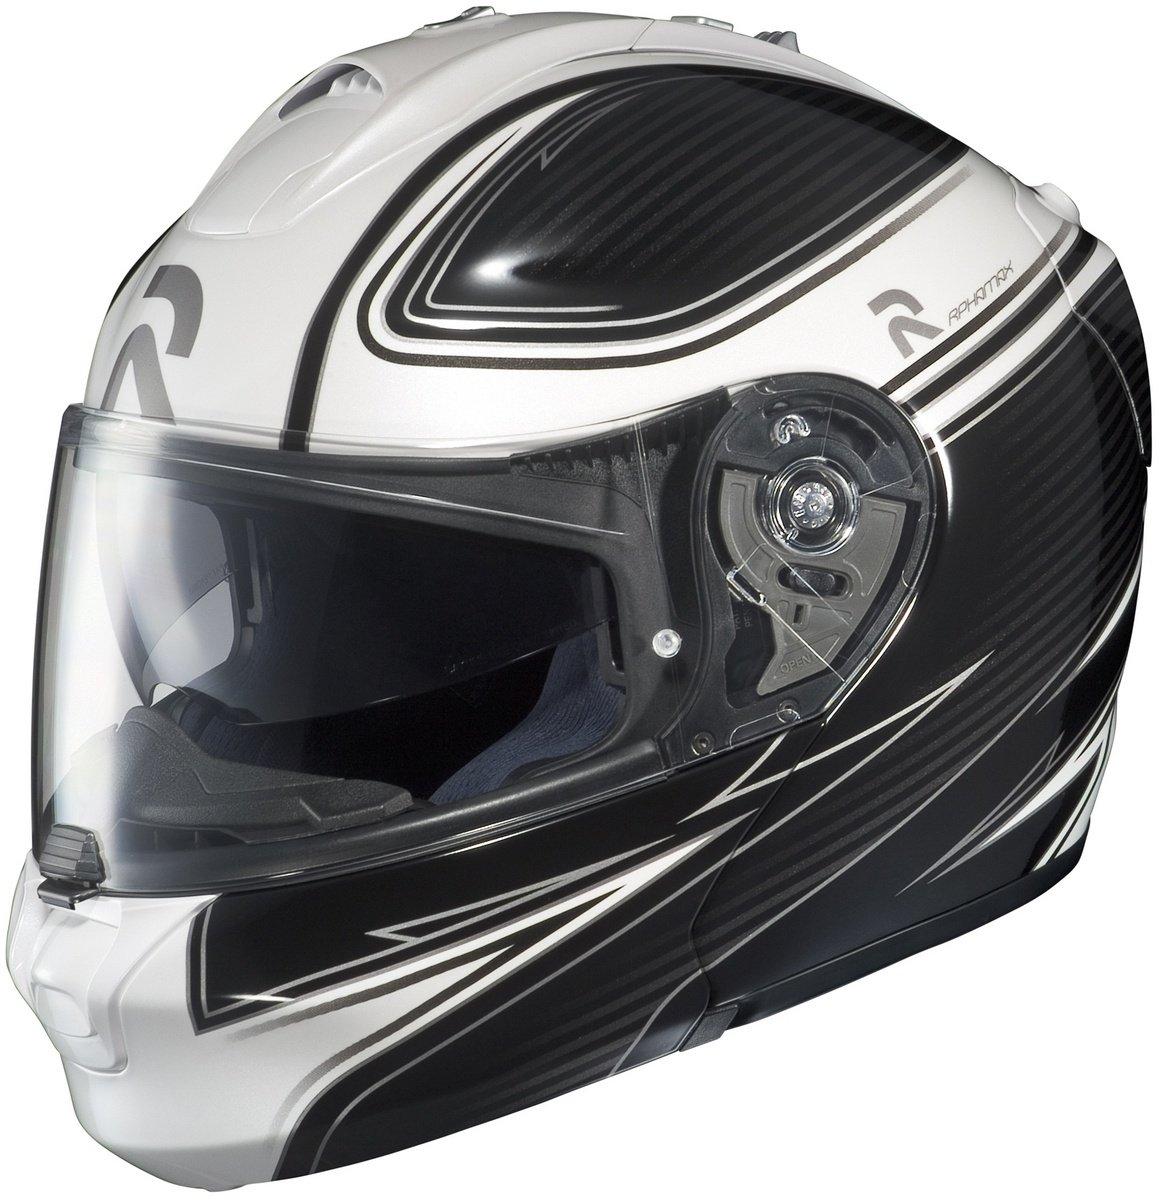 HJC RHPA-Max Modular Motorcycle Helmet